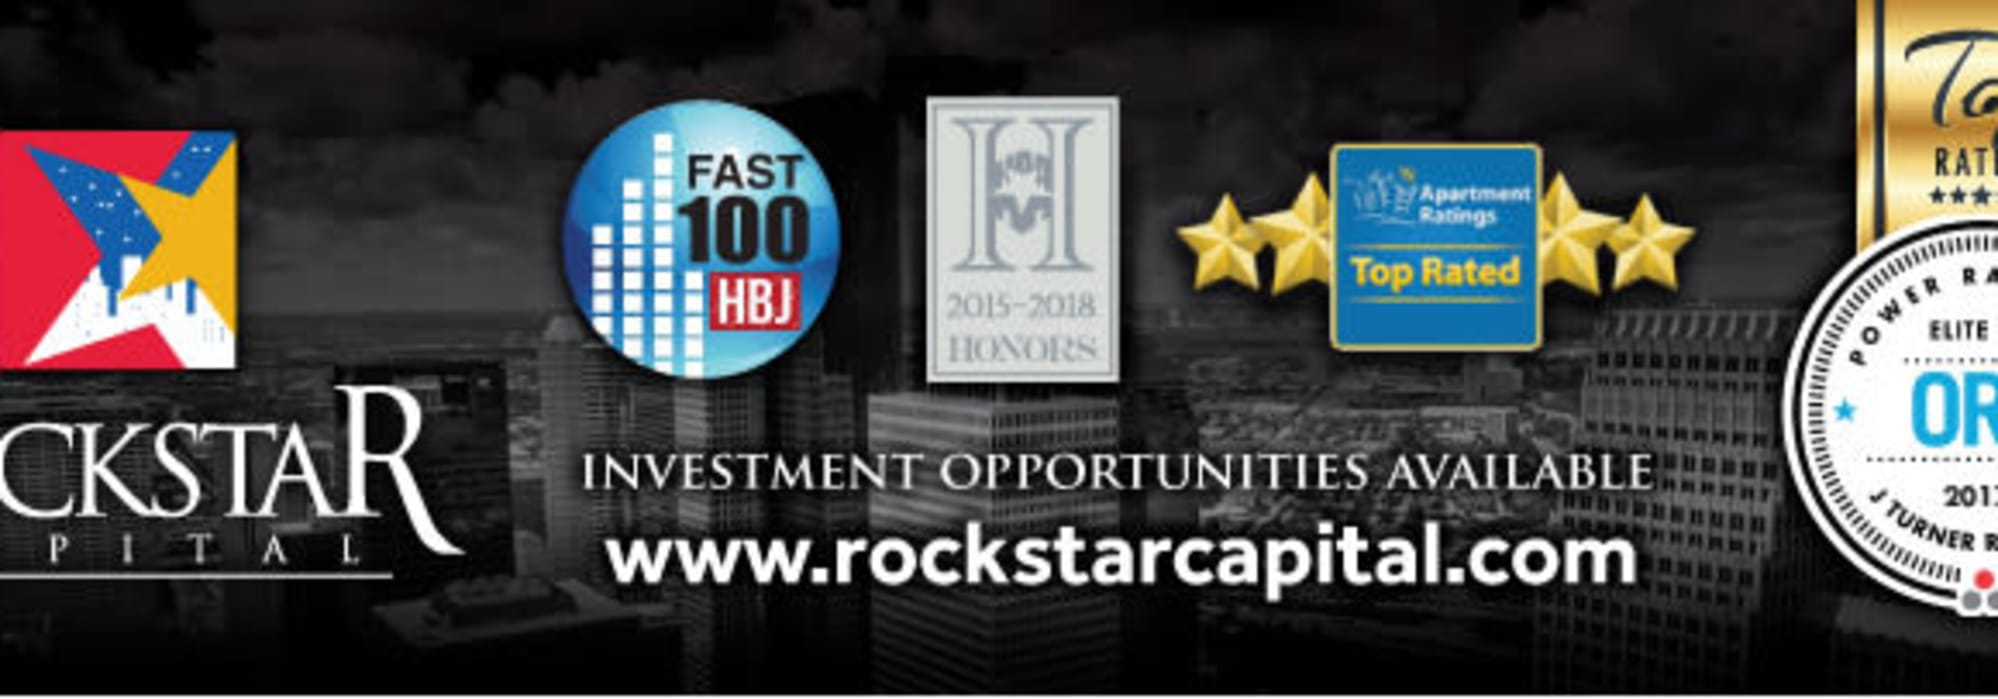 Rockstar Capital in Rosenberg, TX